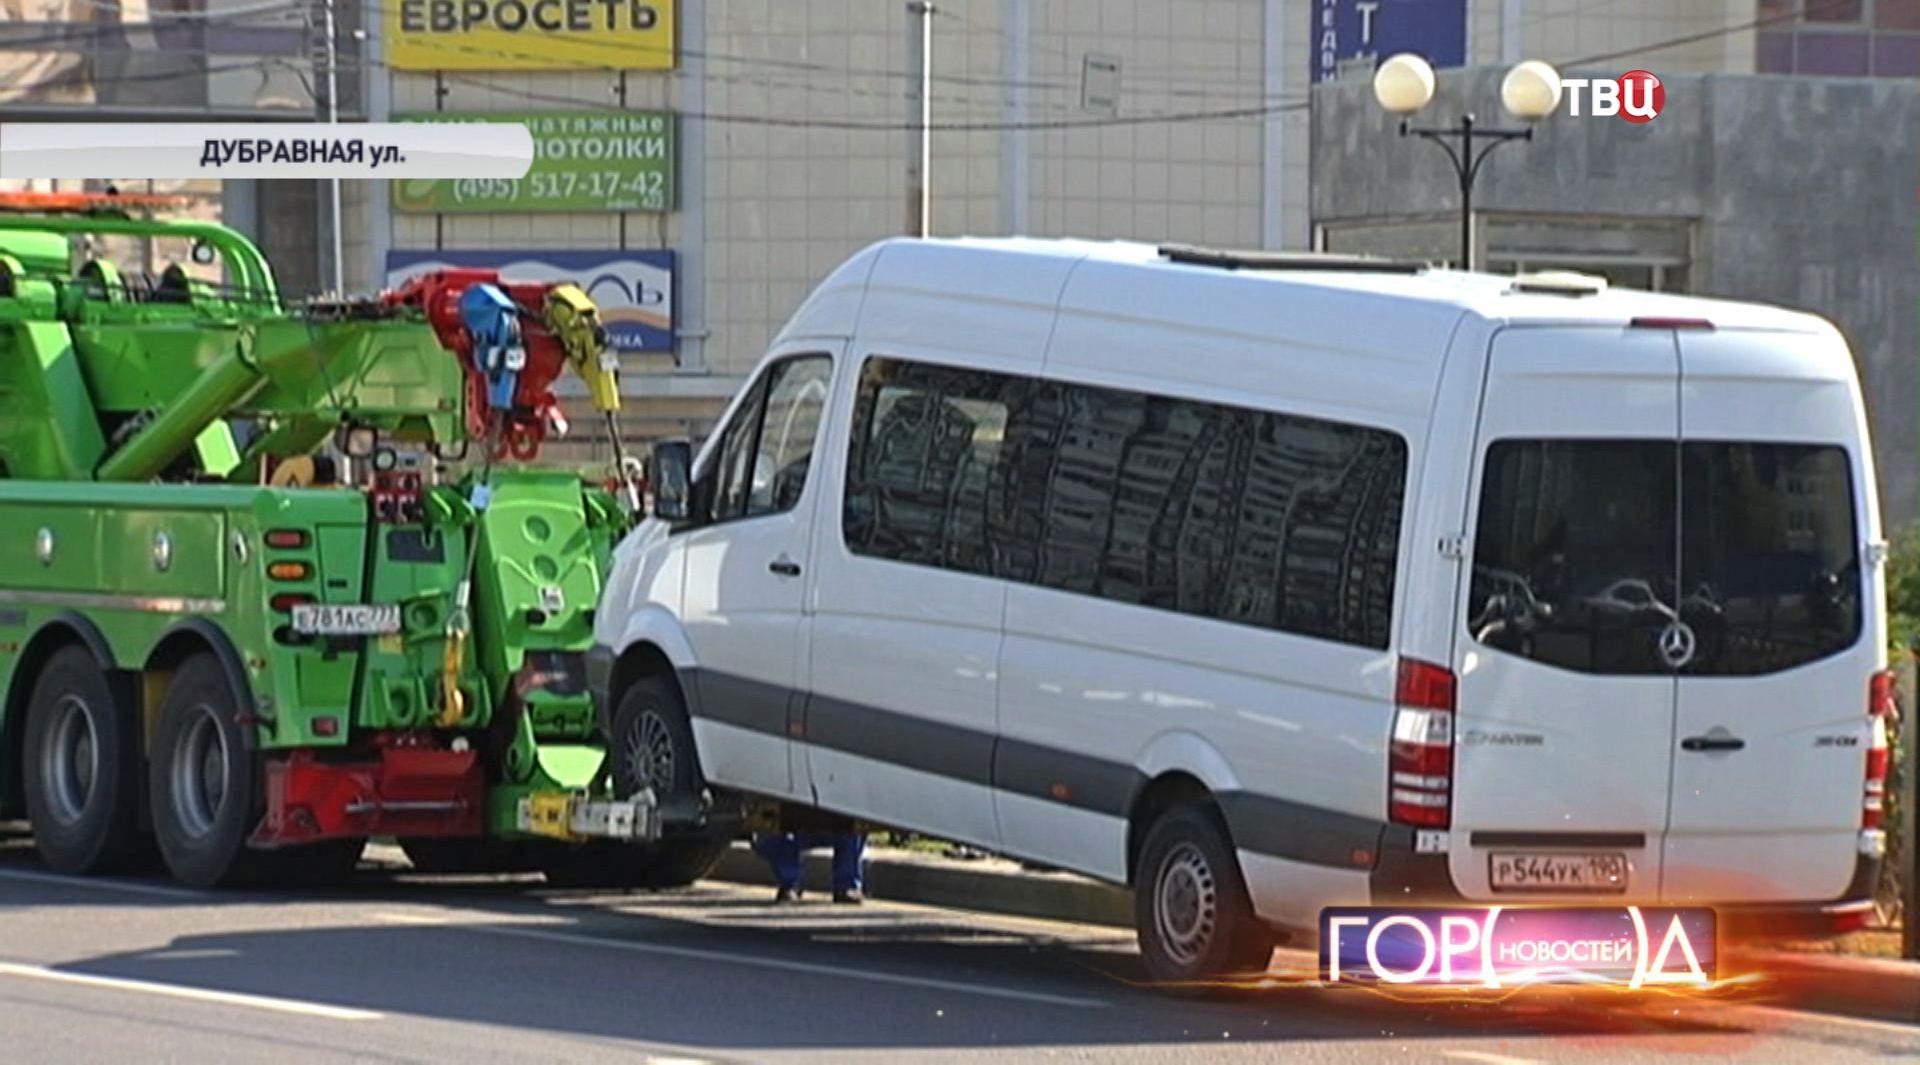 Эвакуатор грузит маршрутку